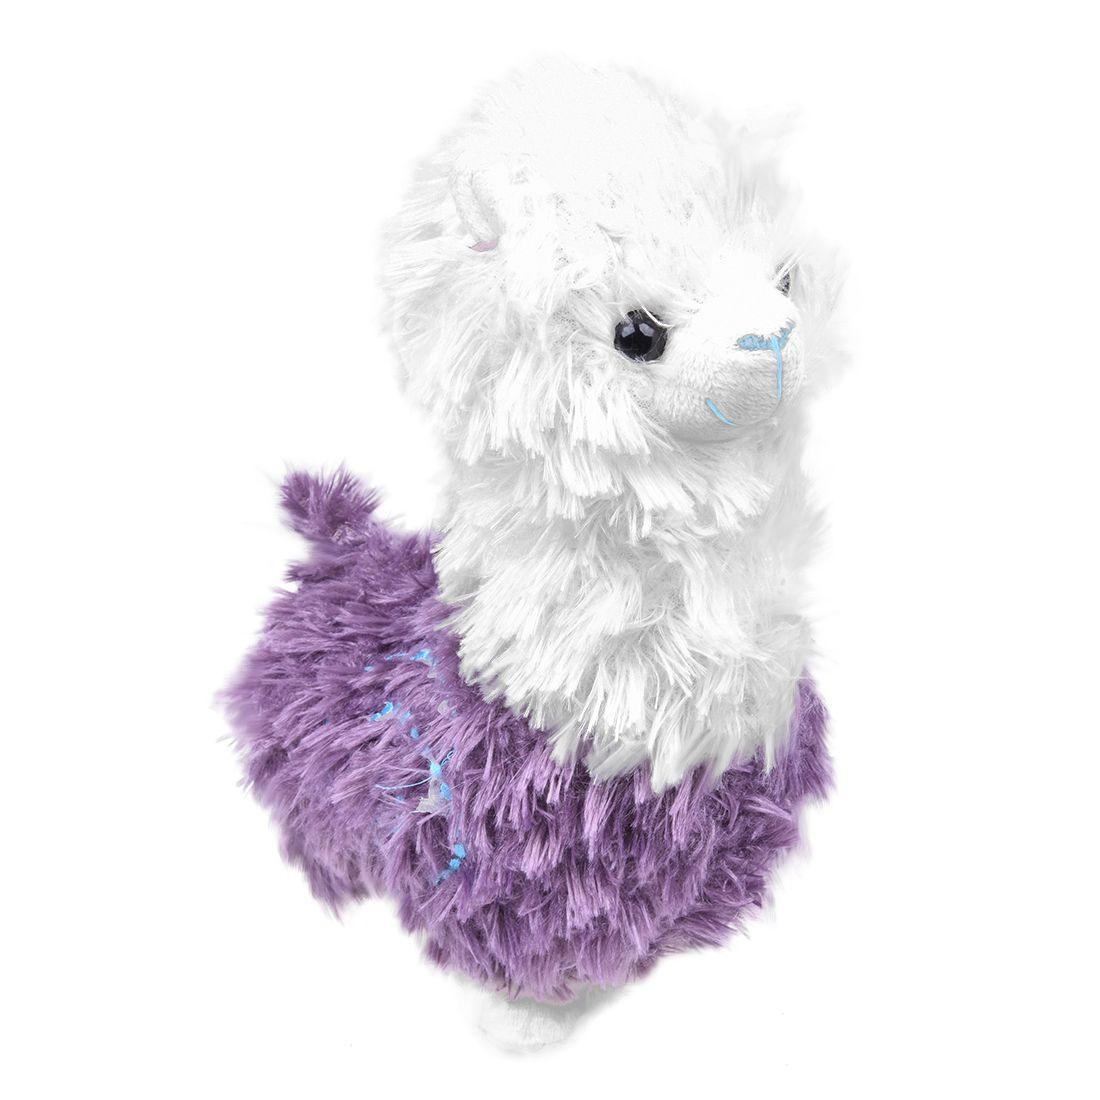 HOT Cute Grass Mud Horse Llama Alpaca Sheep Fleece Stuffed Plush Doll Toys Purple 20cm